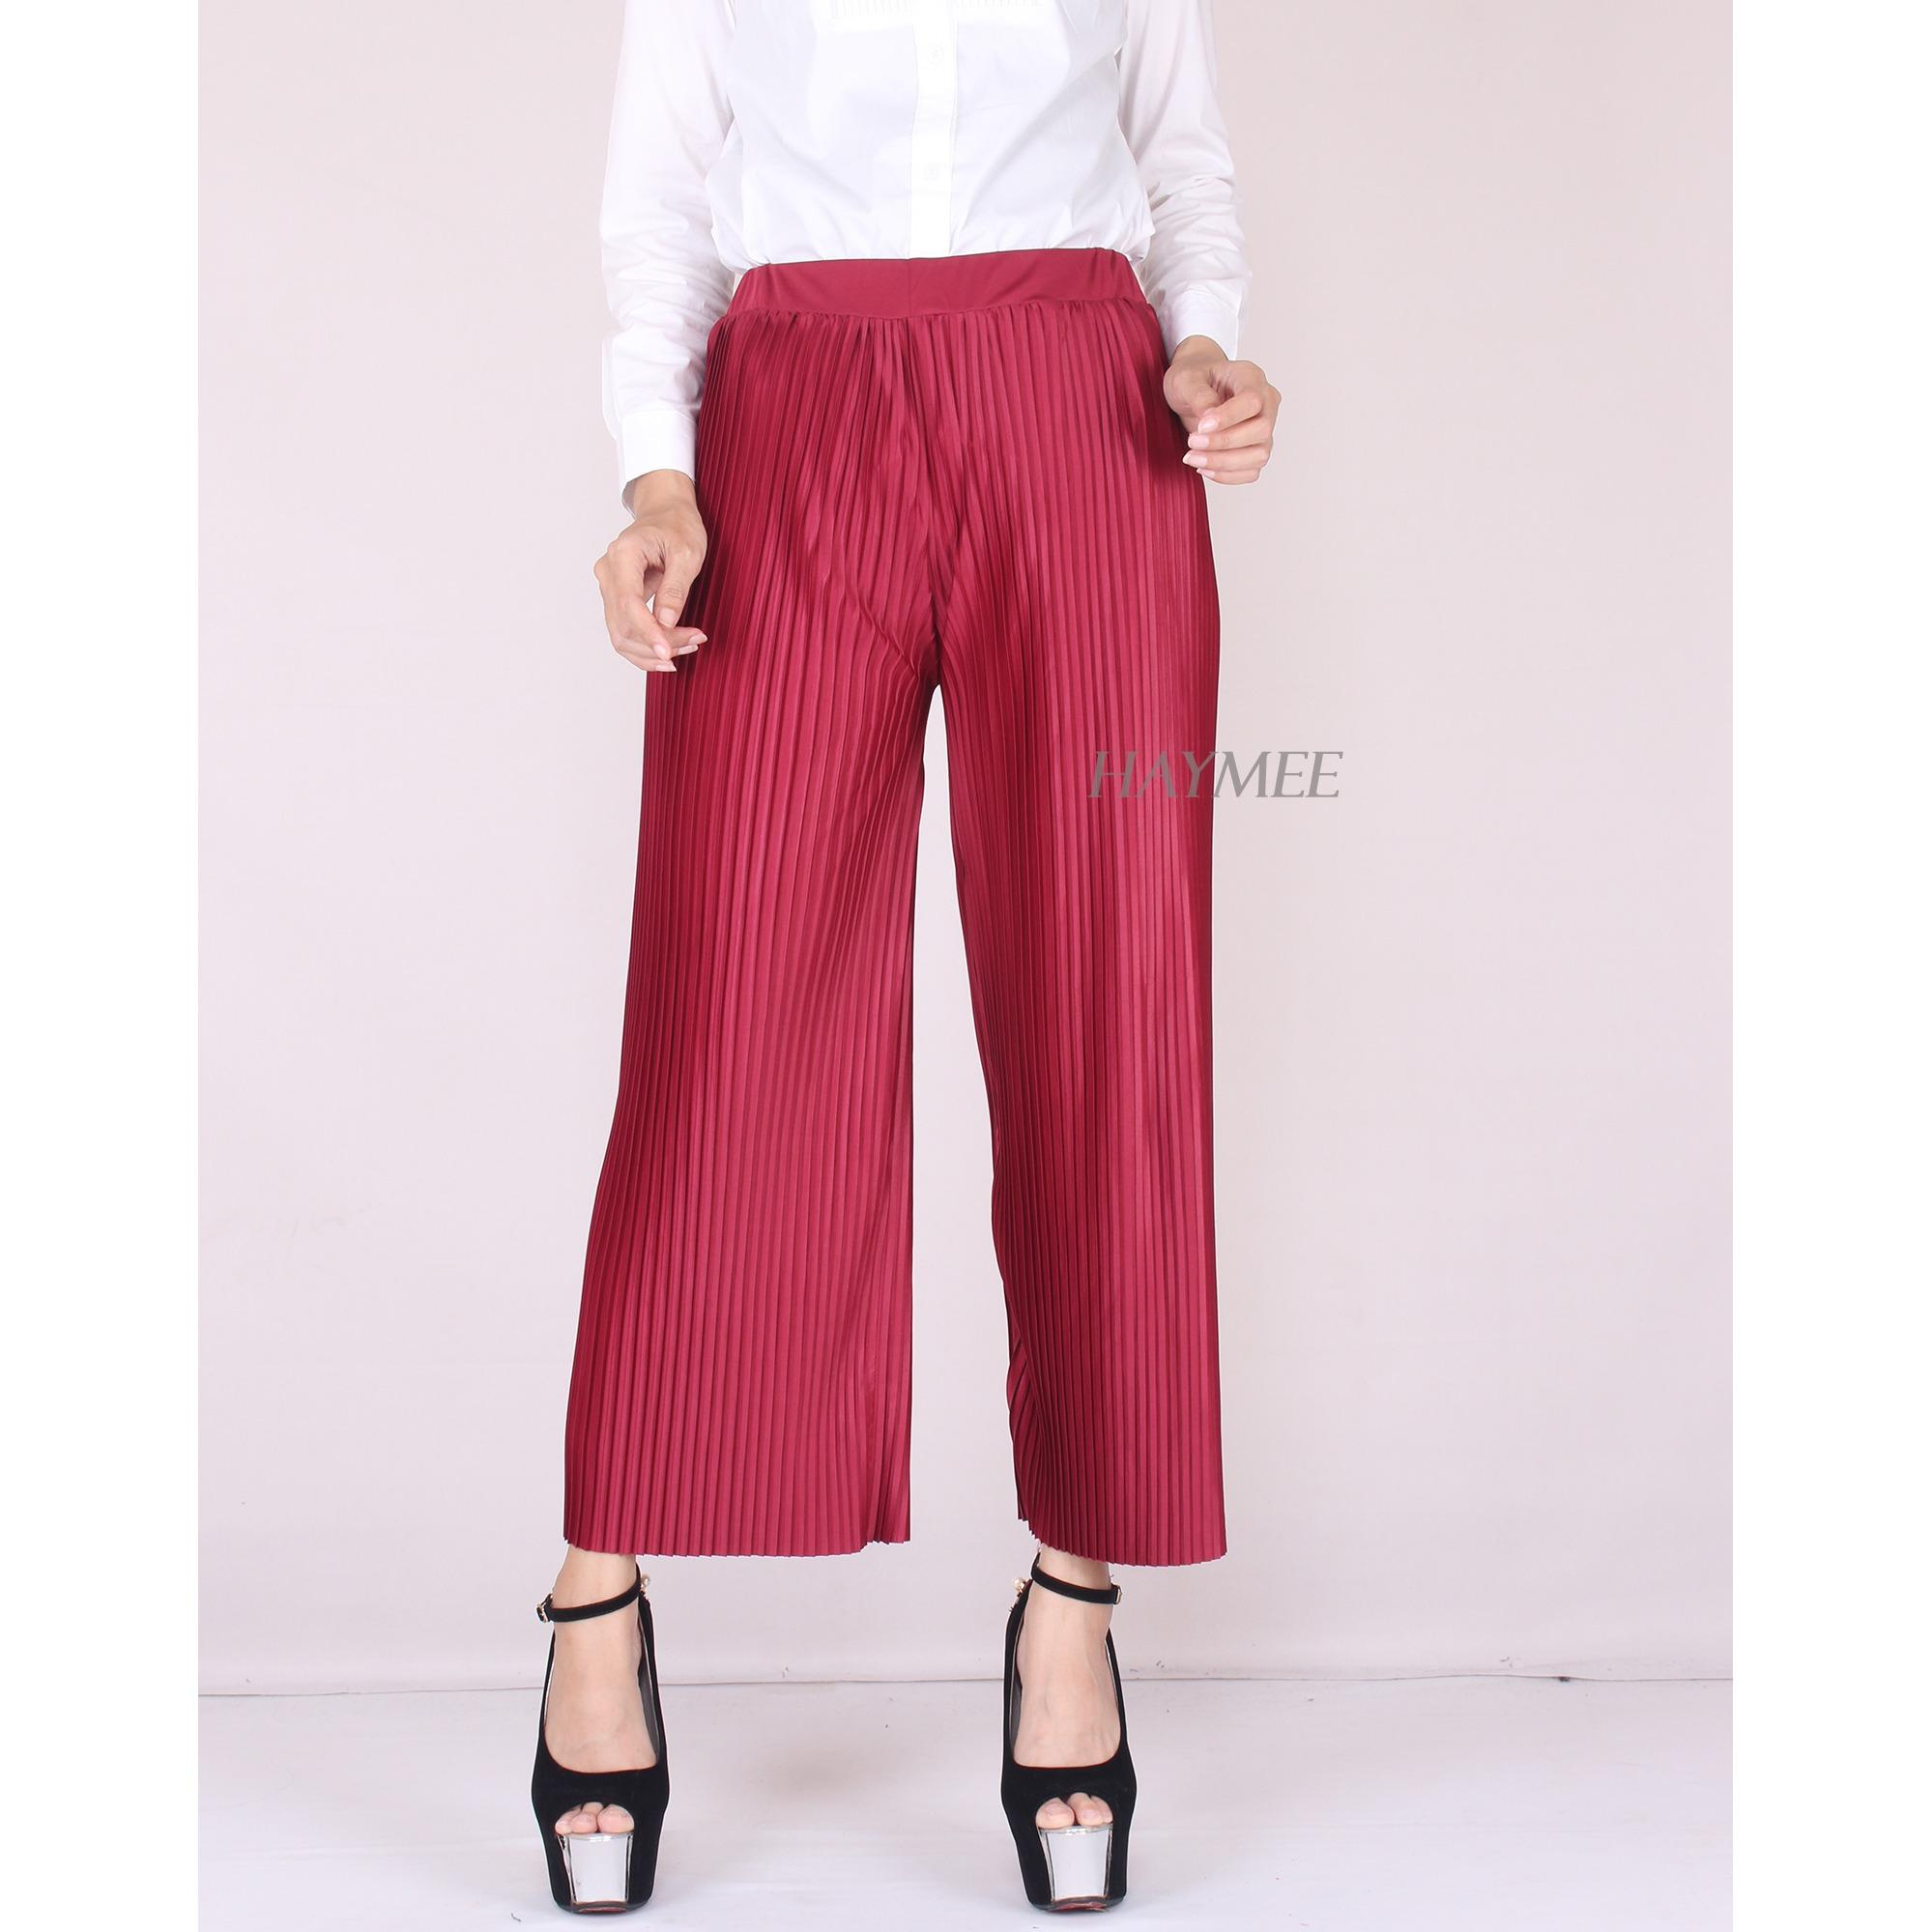 Promo Haymeestore Celana Plisket Kulot Wanita Celana Pleats Cullot Cewek Kantor Casual Fashion Celana Terbaru